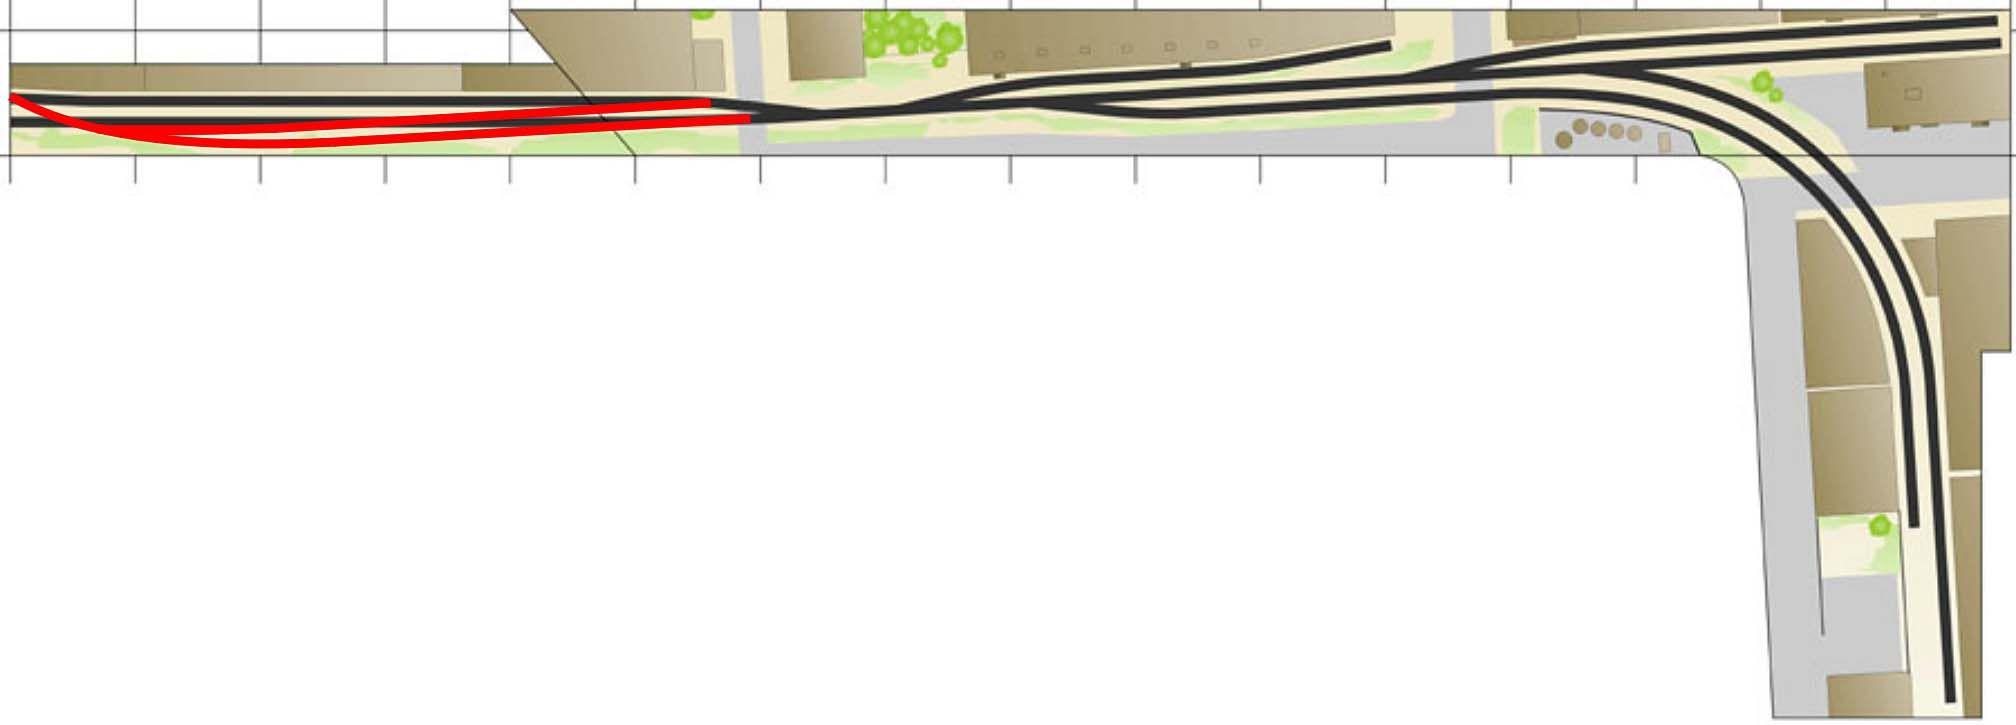 Ho Shelf Plan Train Layouts Bing Images Model railway